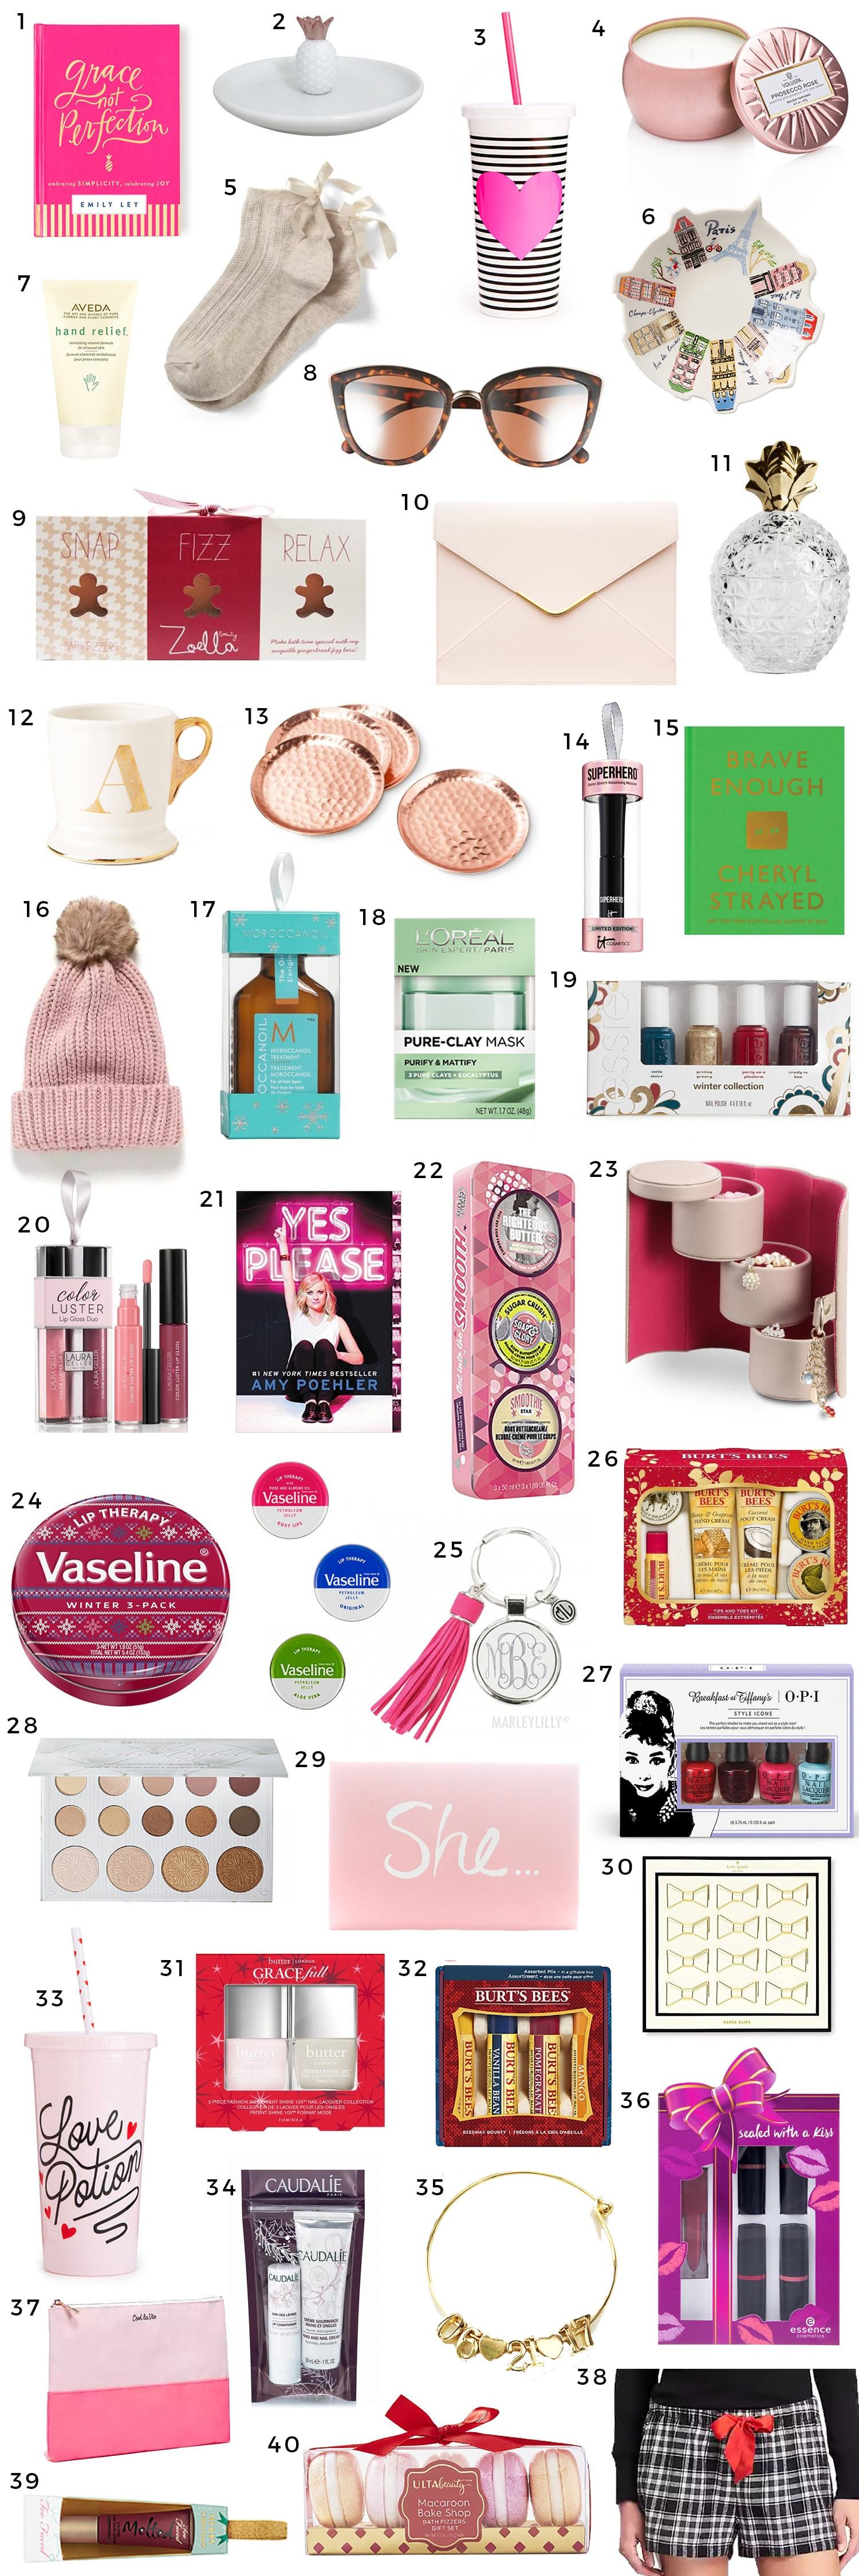 Best Christmas Gift Ideas  The Best Christmas Gift Ideas for Women Under $15